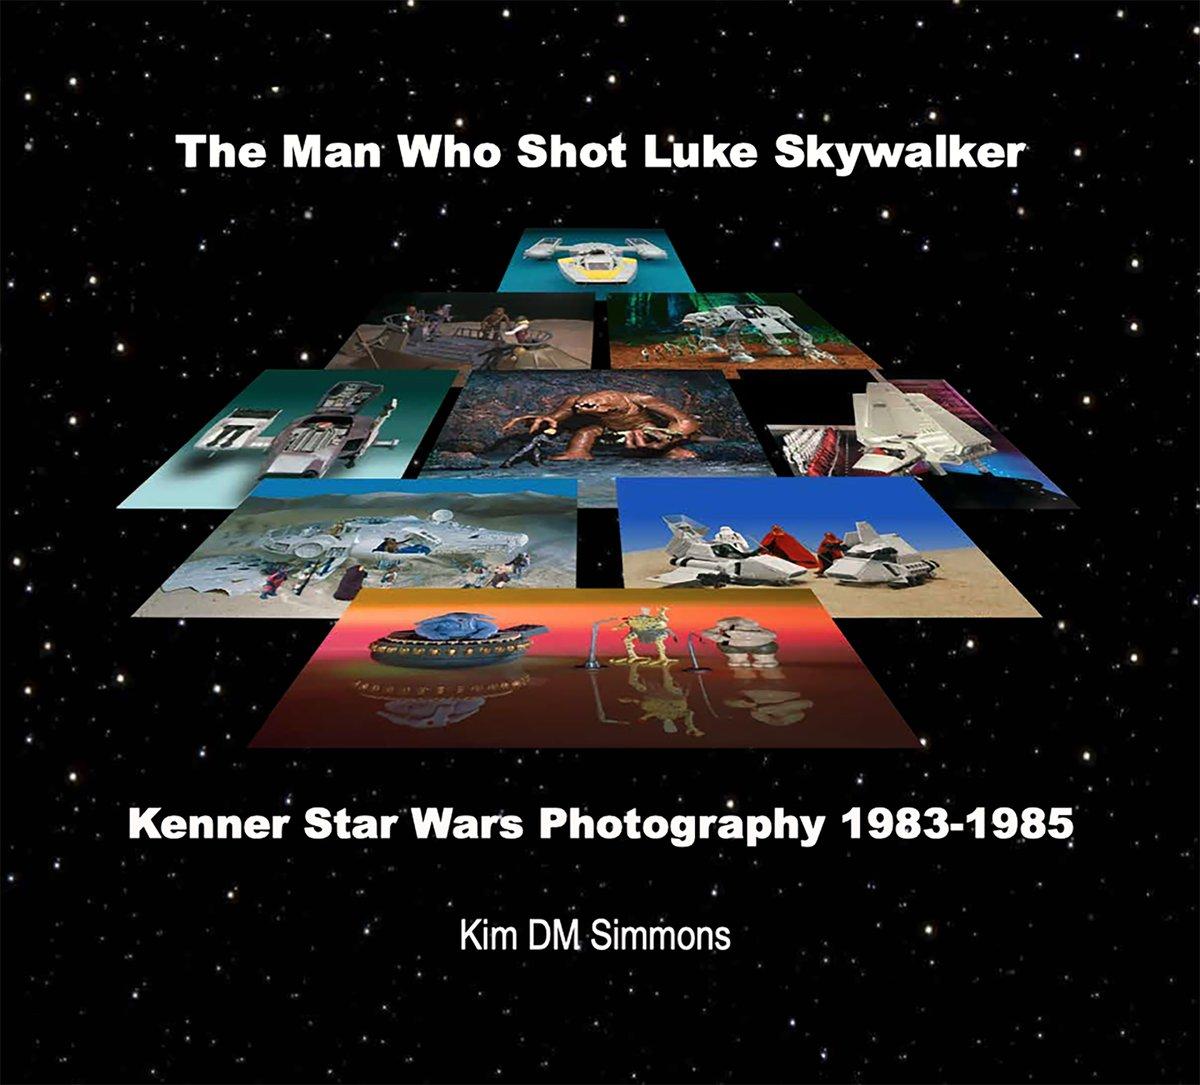 The Man Who Shot Luke Skywalker (Kenner Star Wars Photography Volume 3)